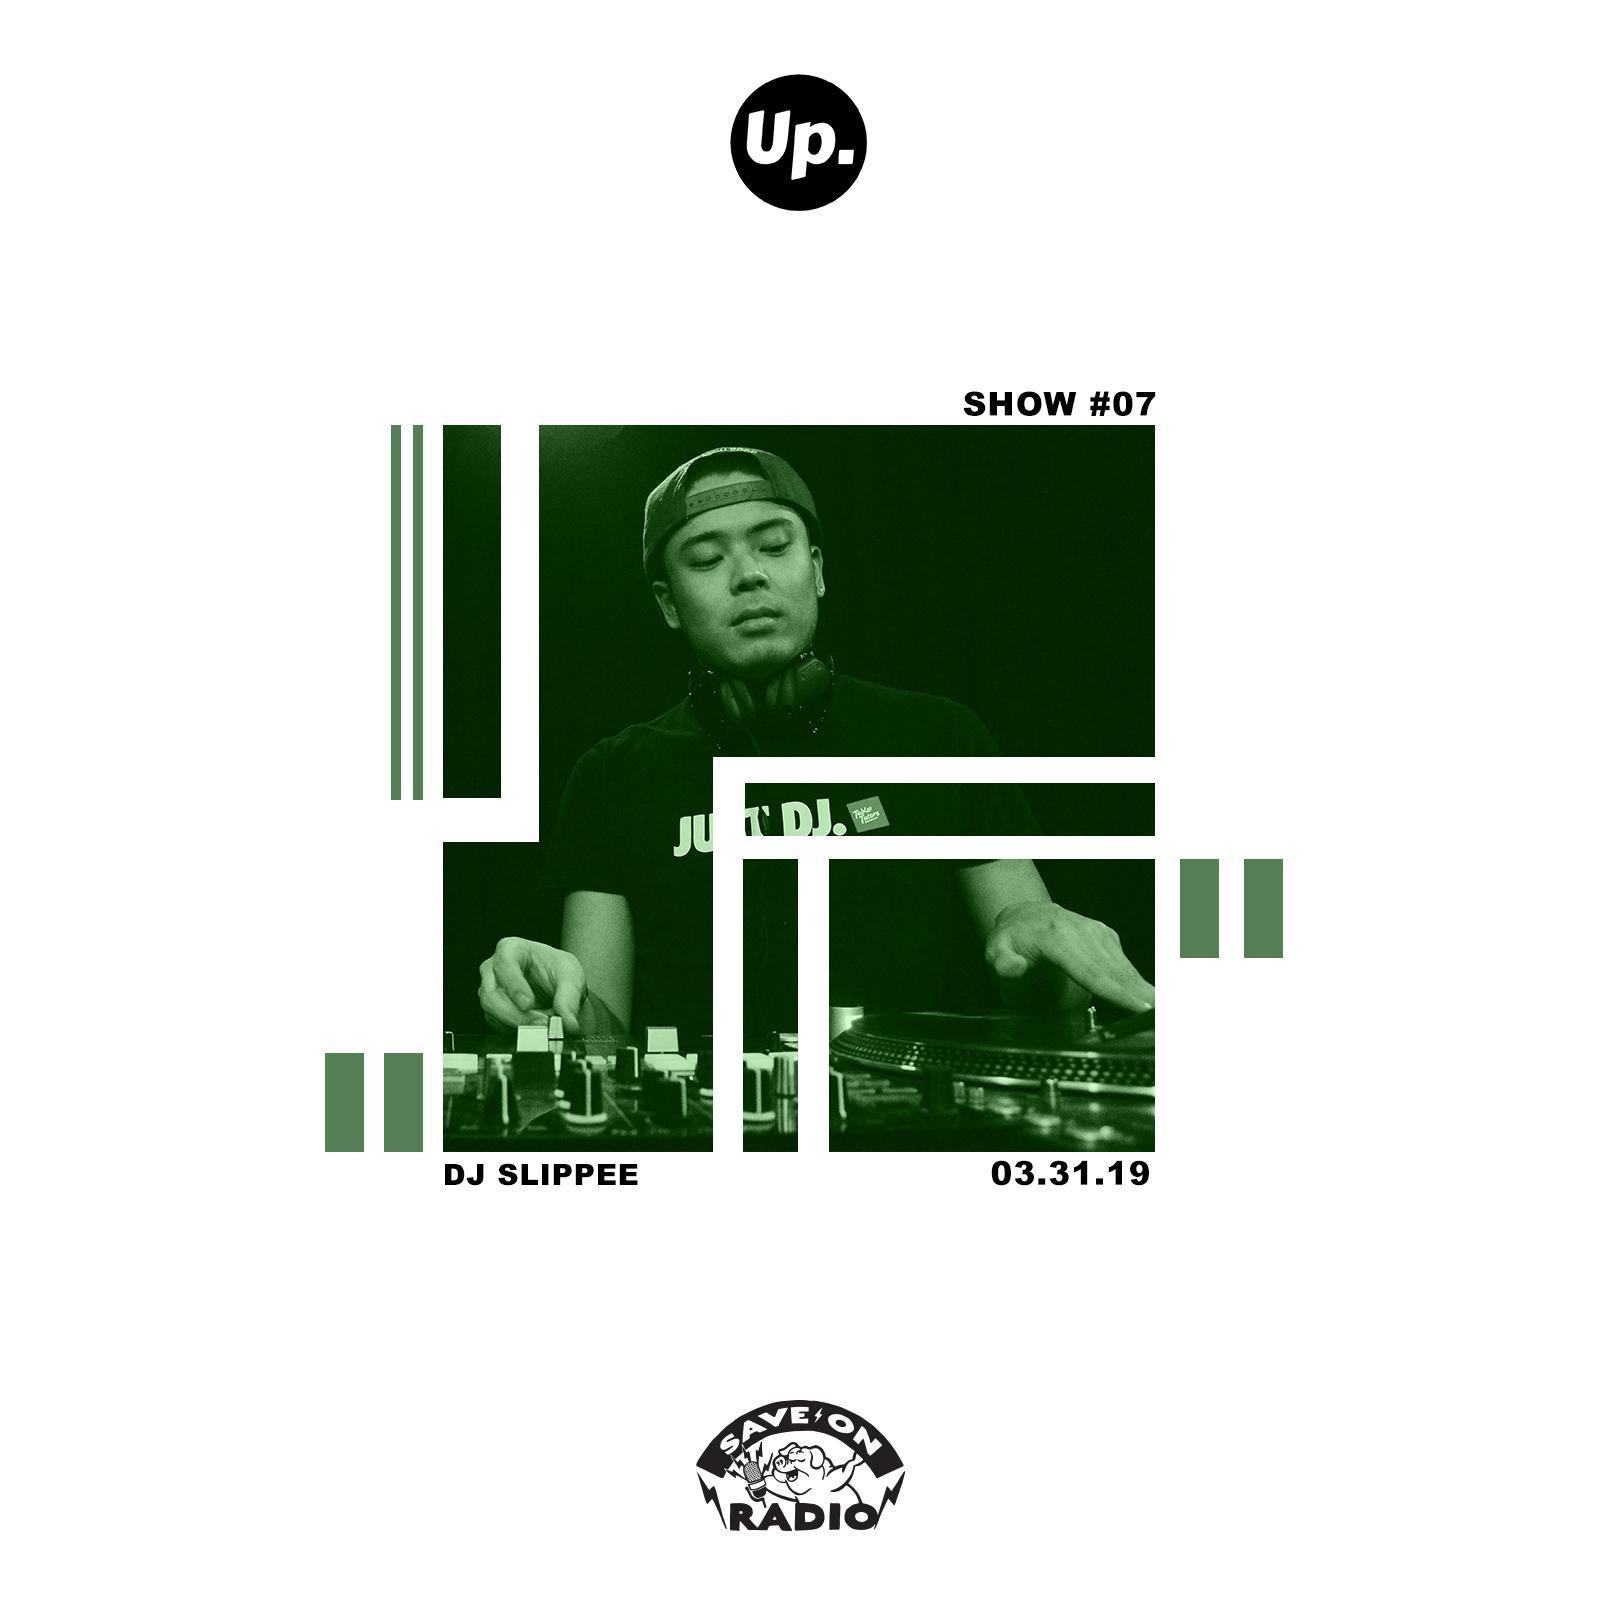 Show #07 featuring DJ Slippee